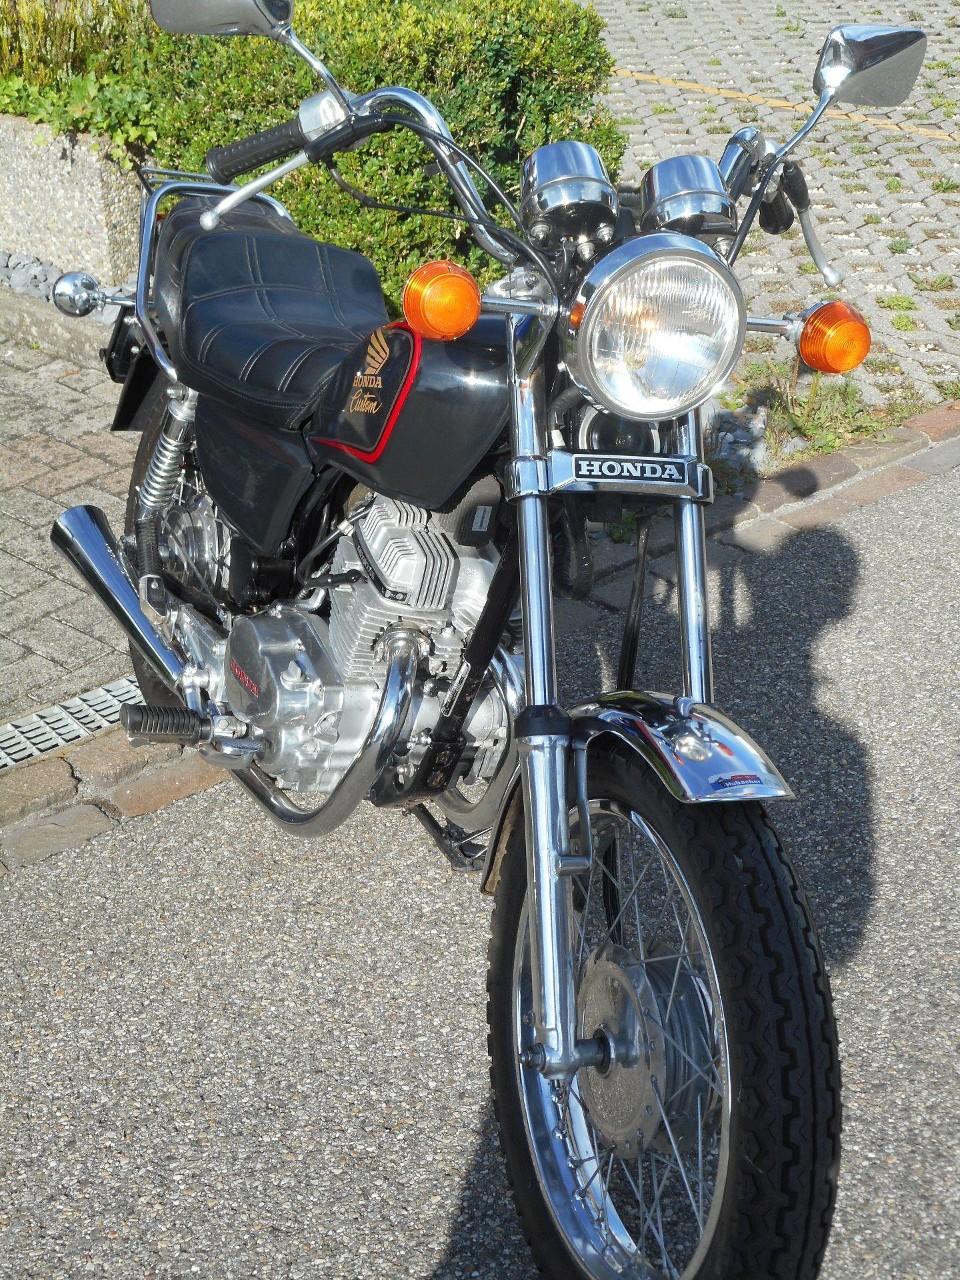 moto occasions acheter honda cm 125 c hubacher a velos motos ag oftringen. Black Bedroom Furniture Sets. Home Design Ideas